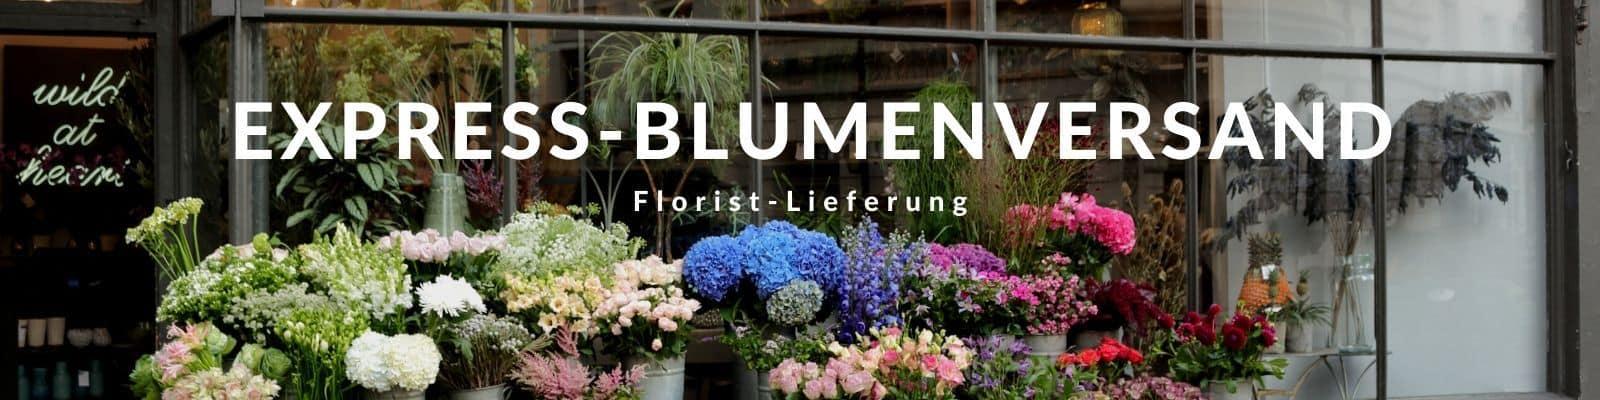 Blumen per Express verschicken - Blumenversand - heute liefern